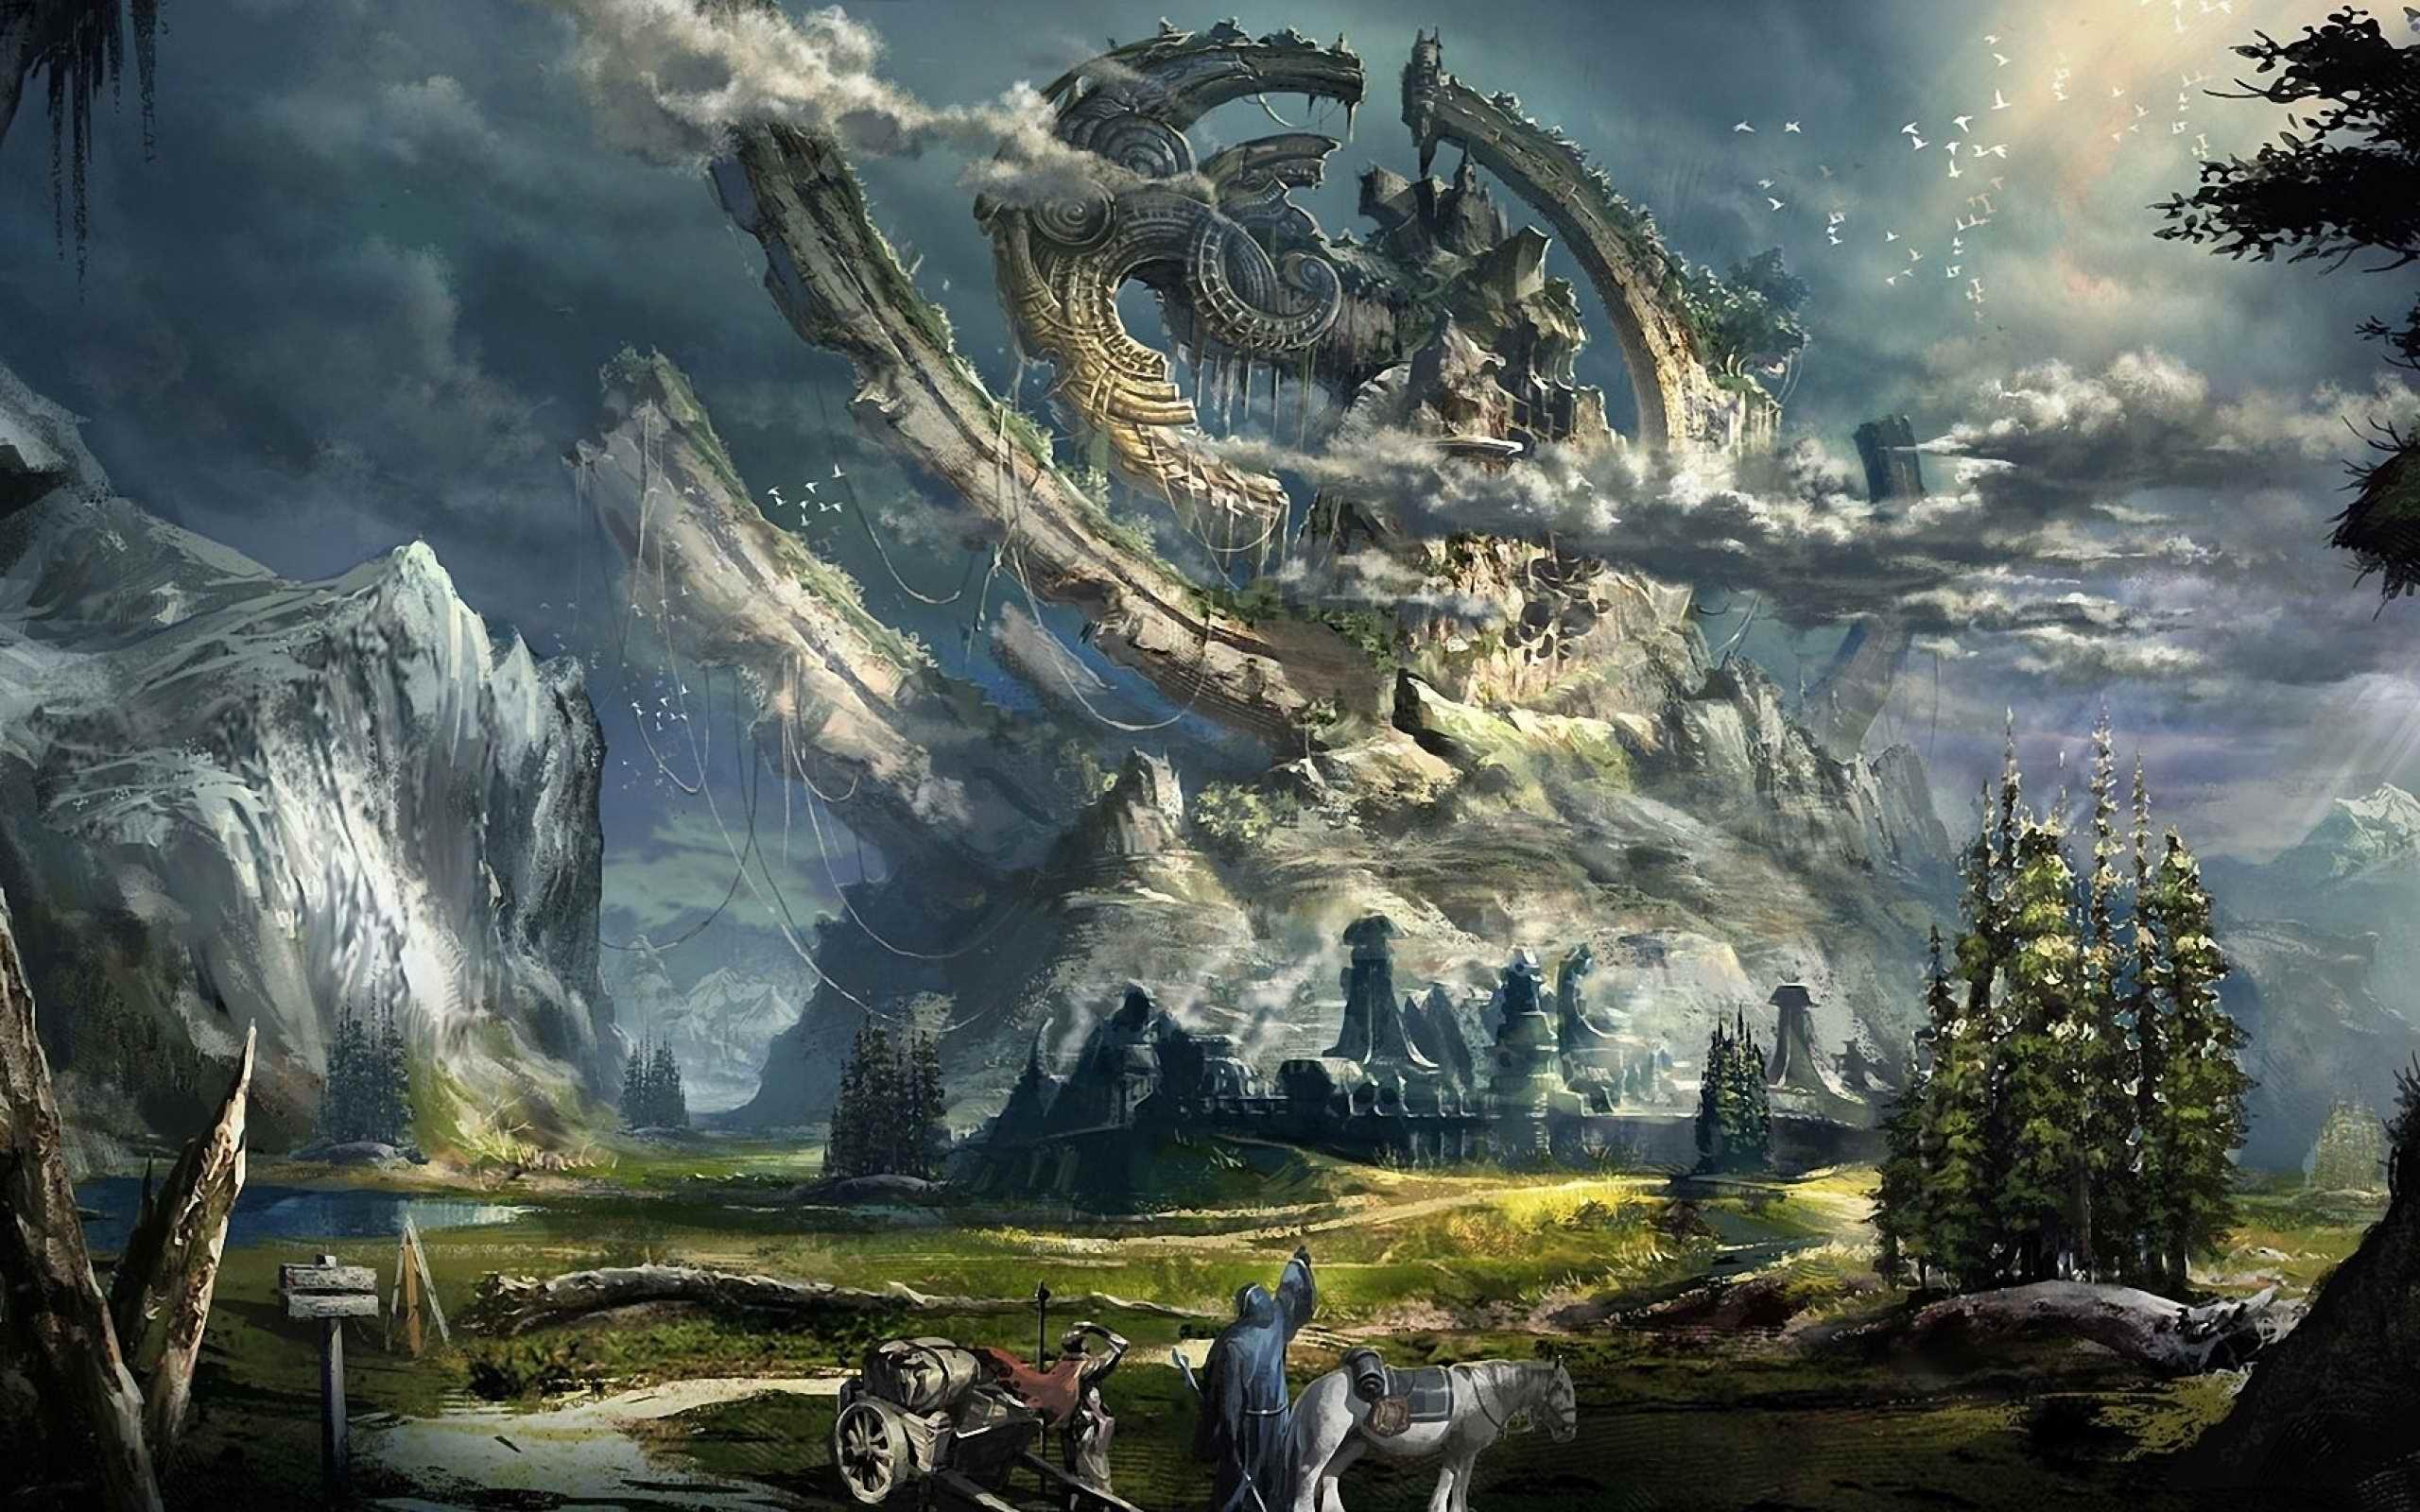 Tera online fantasy adventure game 72 wallpaper - Fantasy game wallpaper ...